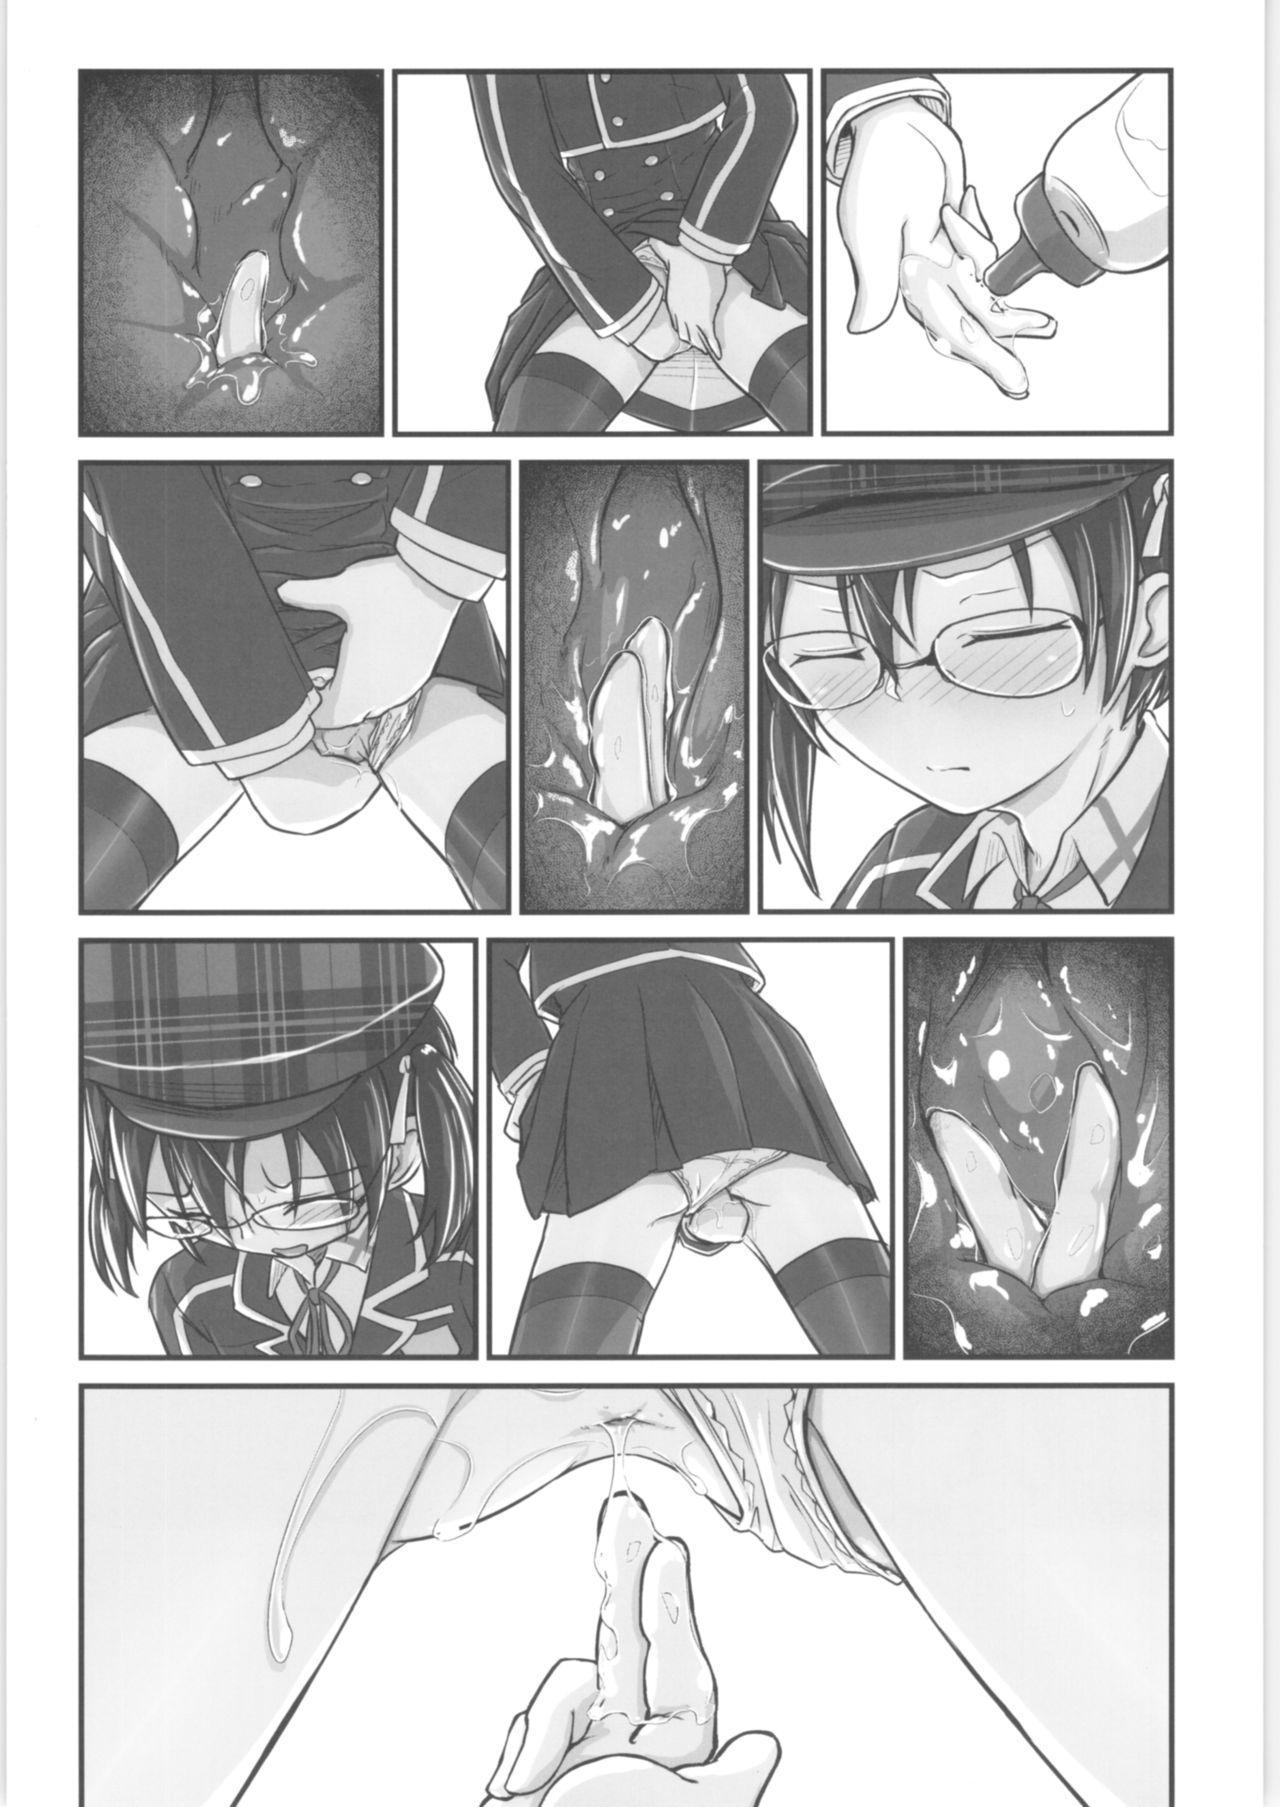 [Umari-ya (D-2)] Kiriko Route Another #05 ~Seifuku Josou Anal Junchi Hen~ (Sword Art Online) ) [Chinese] [不可视汉化] 7